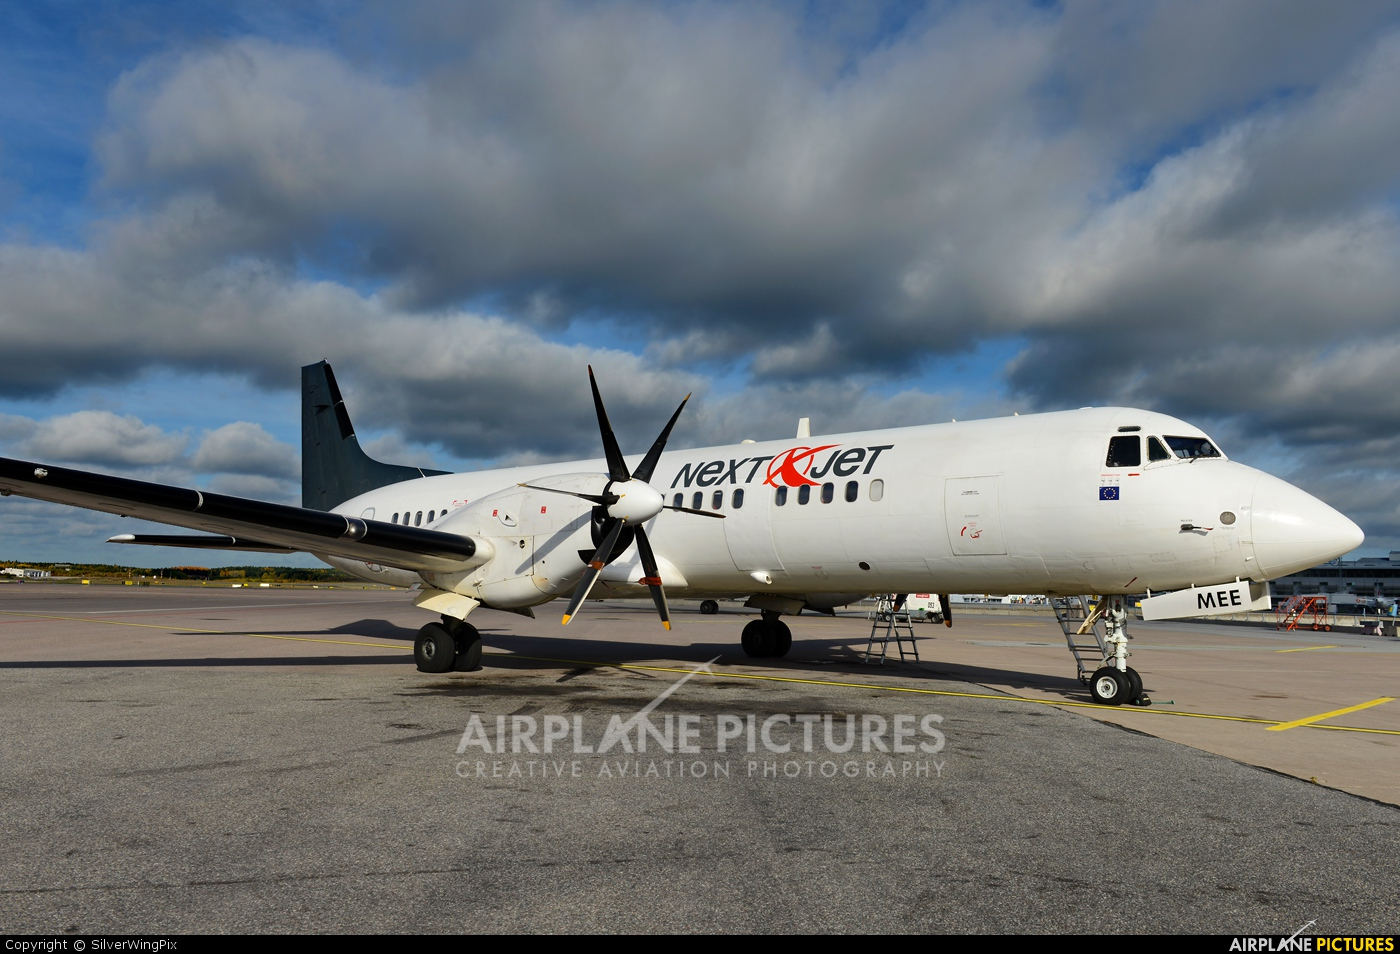 Nextjet SE-MEE aircraft at Stockholm - Arlanda